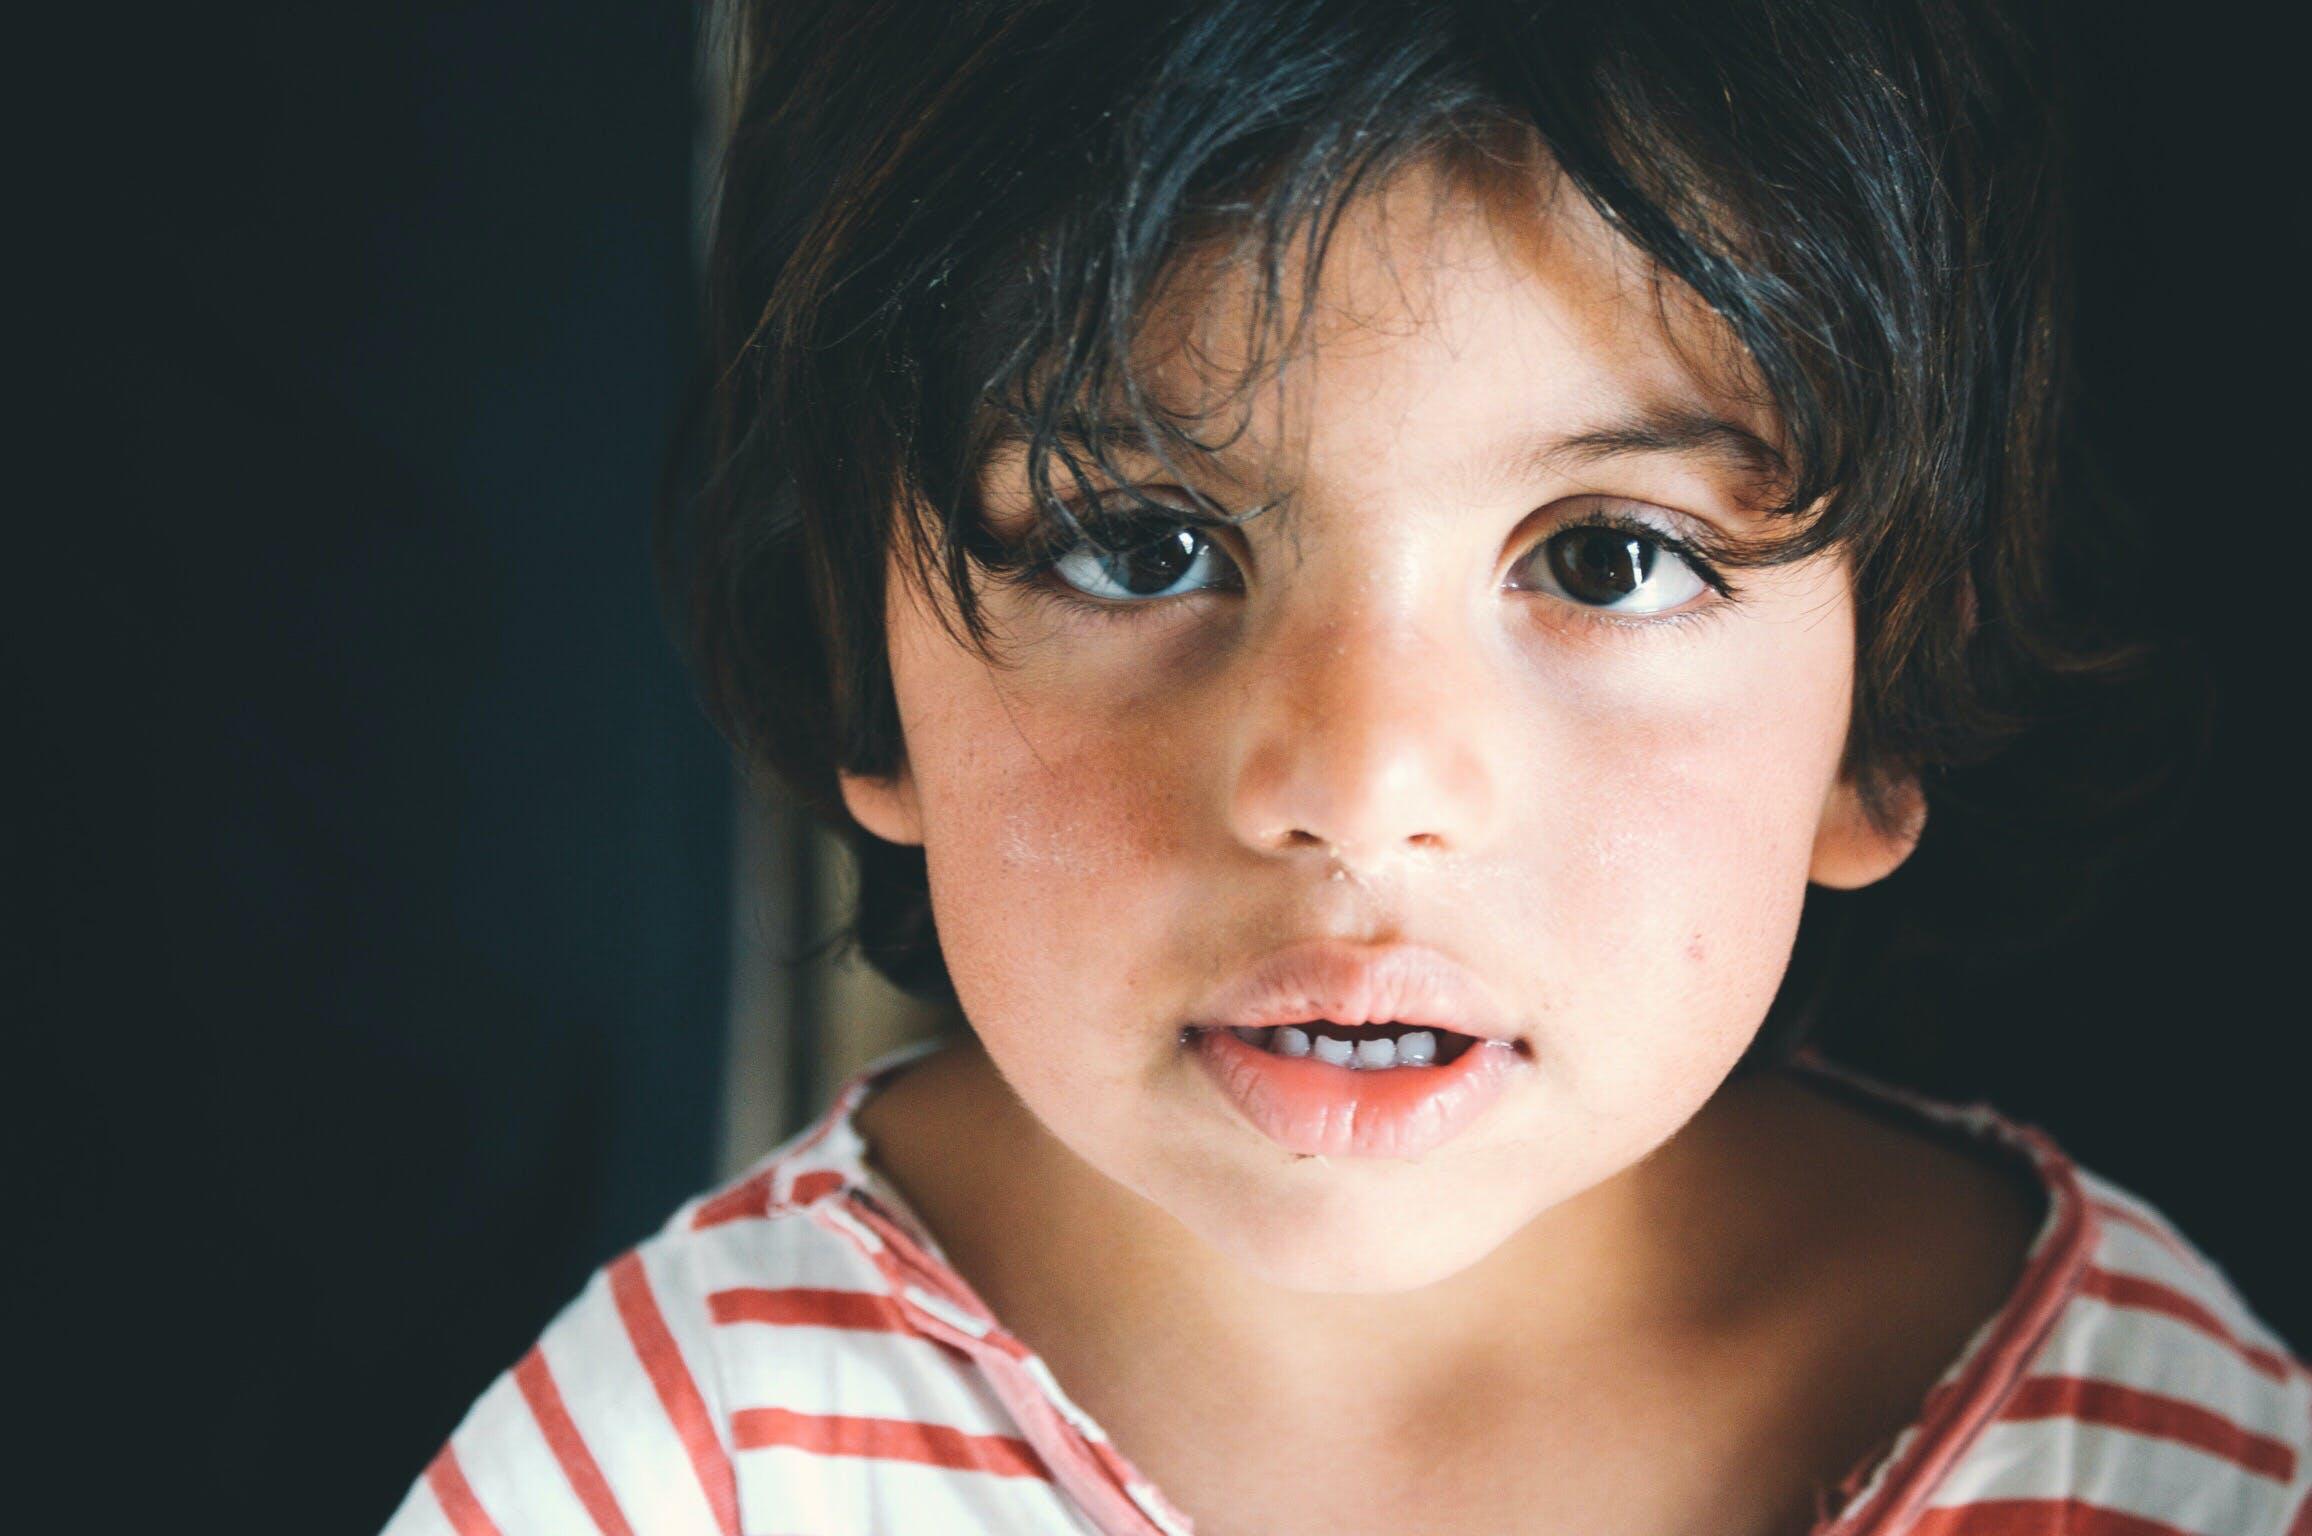 Rasmia's daughter Nour was born in their home in Lebanon.